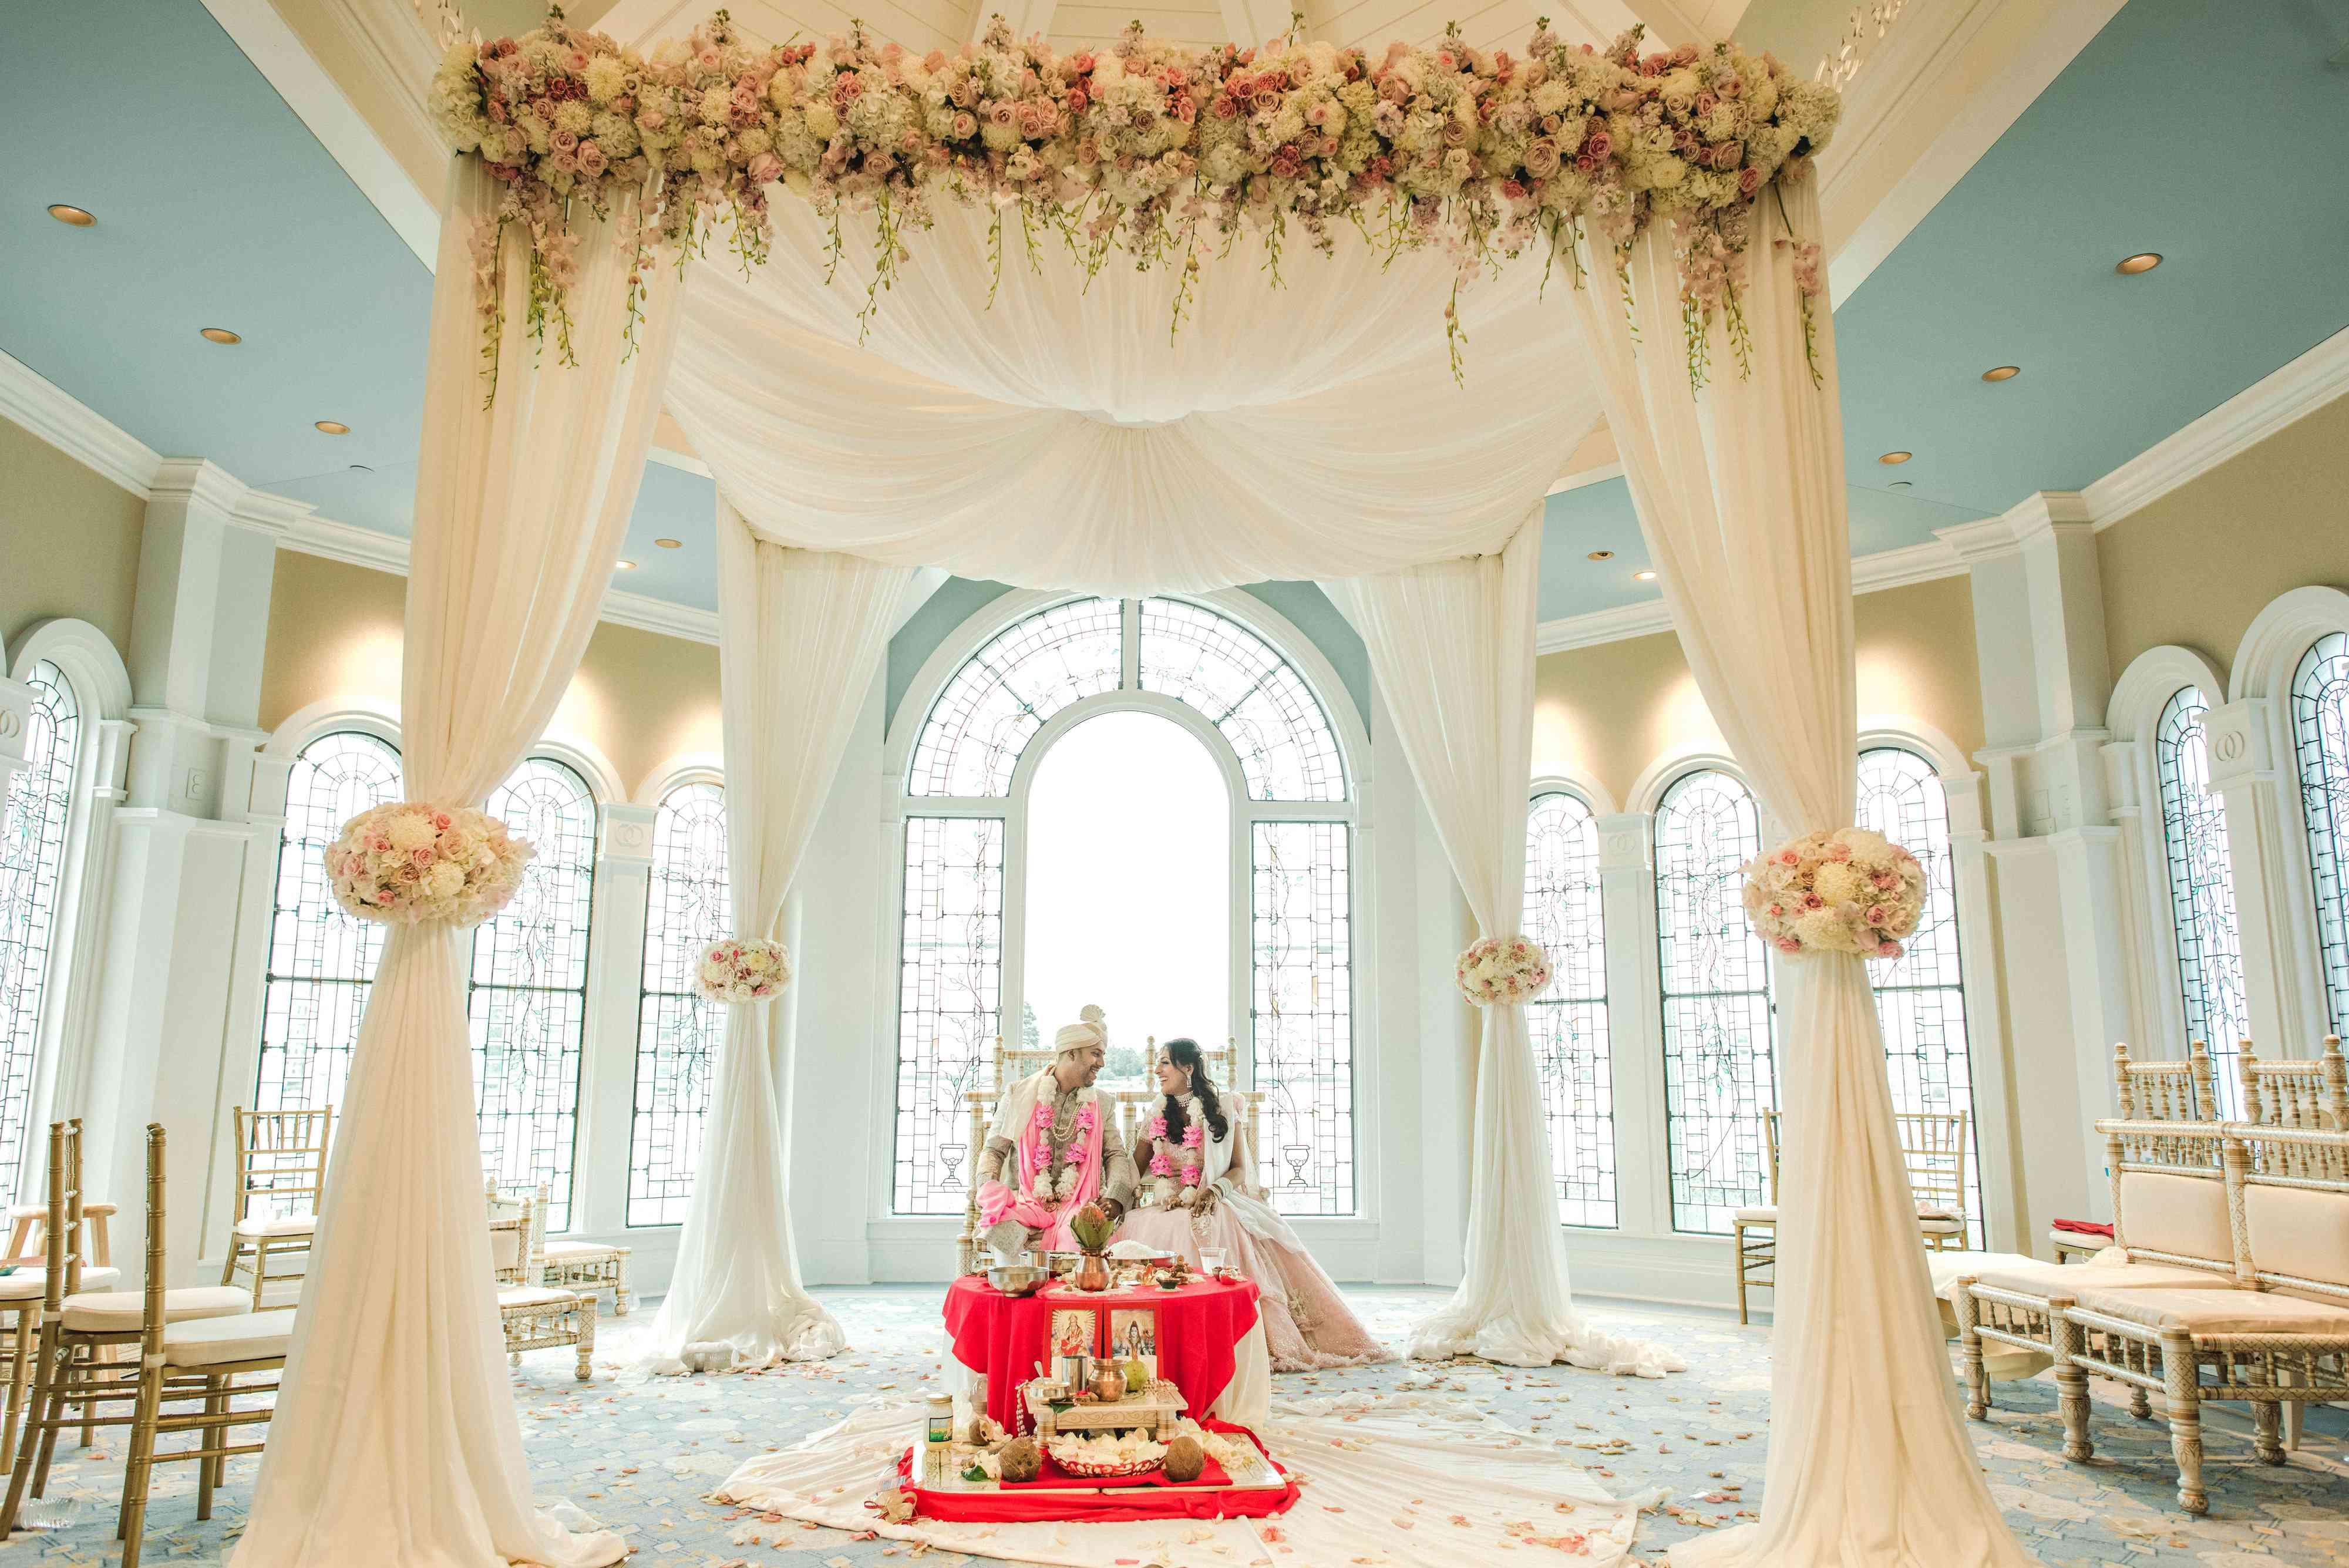 Couple sitting in wedding ceremony room.